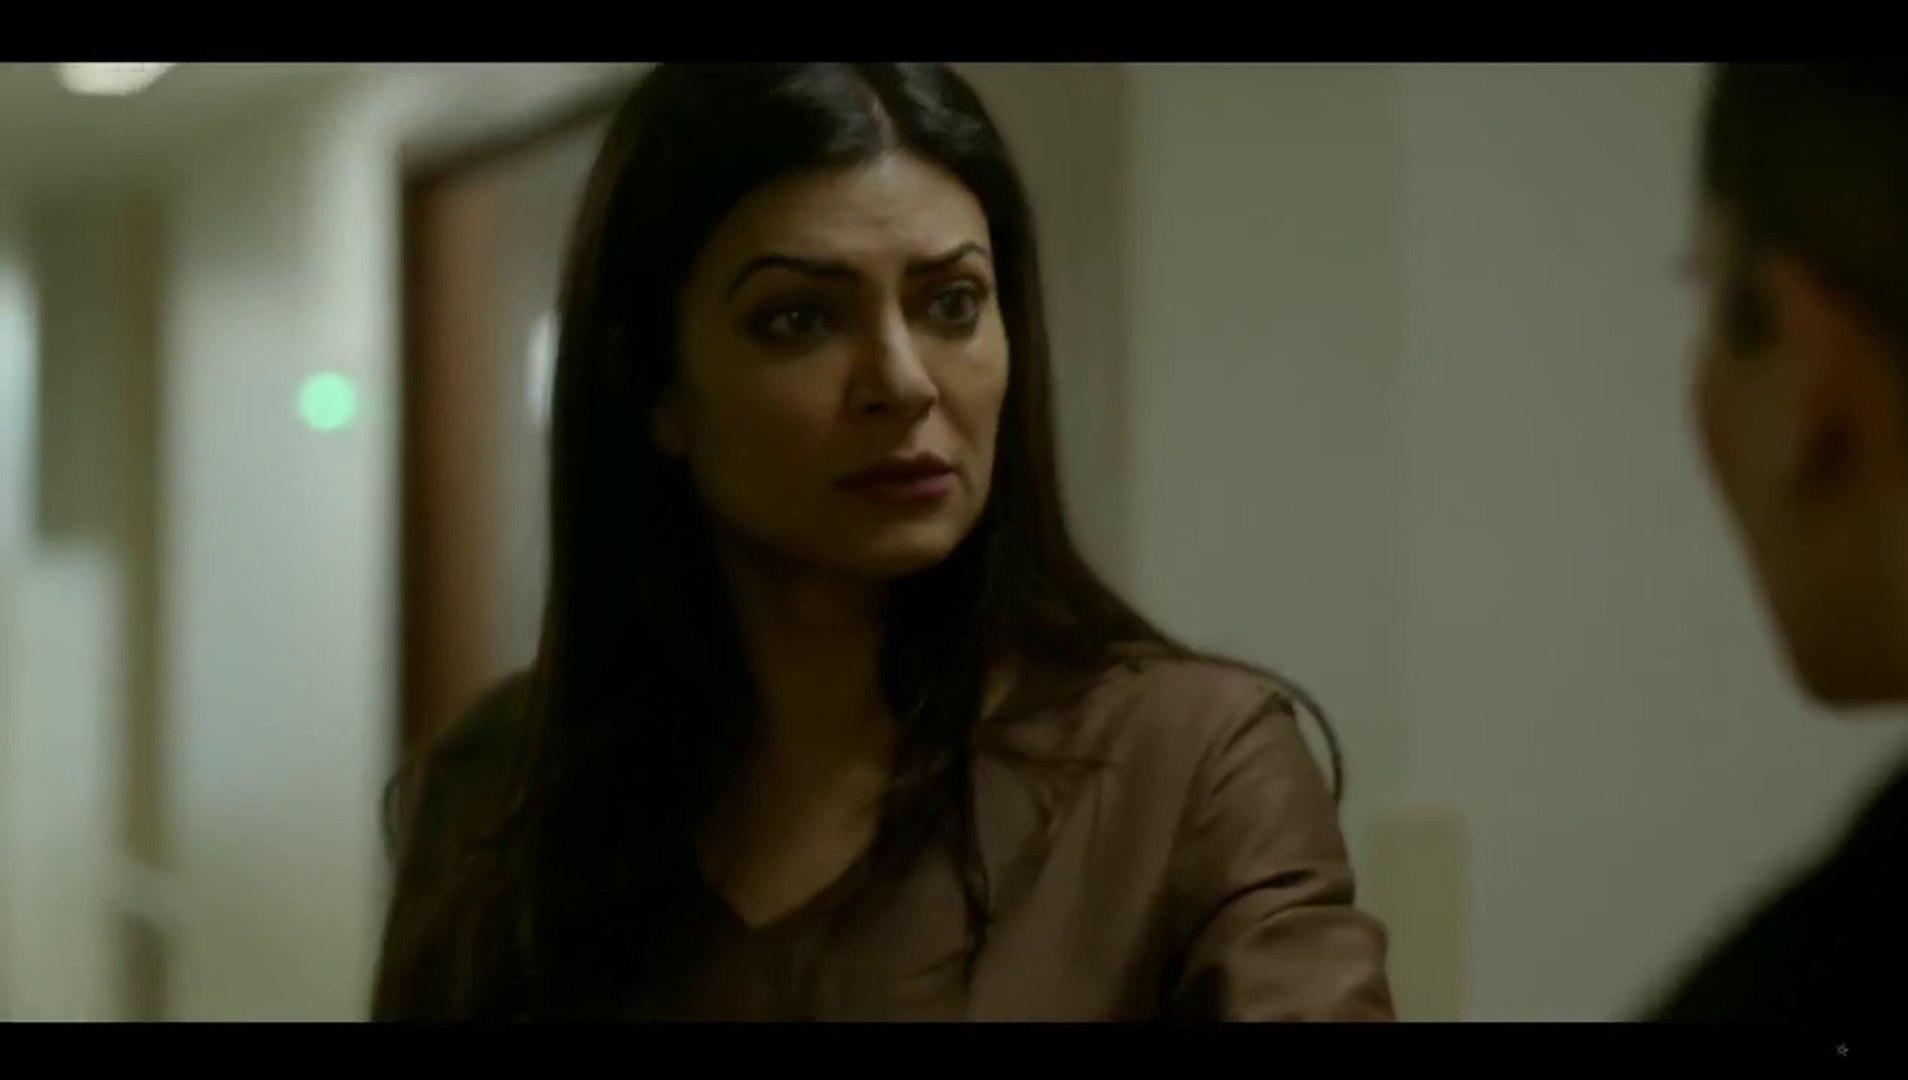 Aarya !! Susmita Sen! Thriller web series-2020!! Season 01 Episode 02